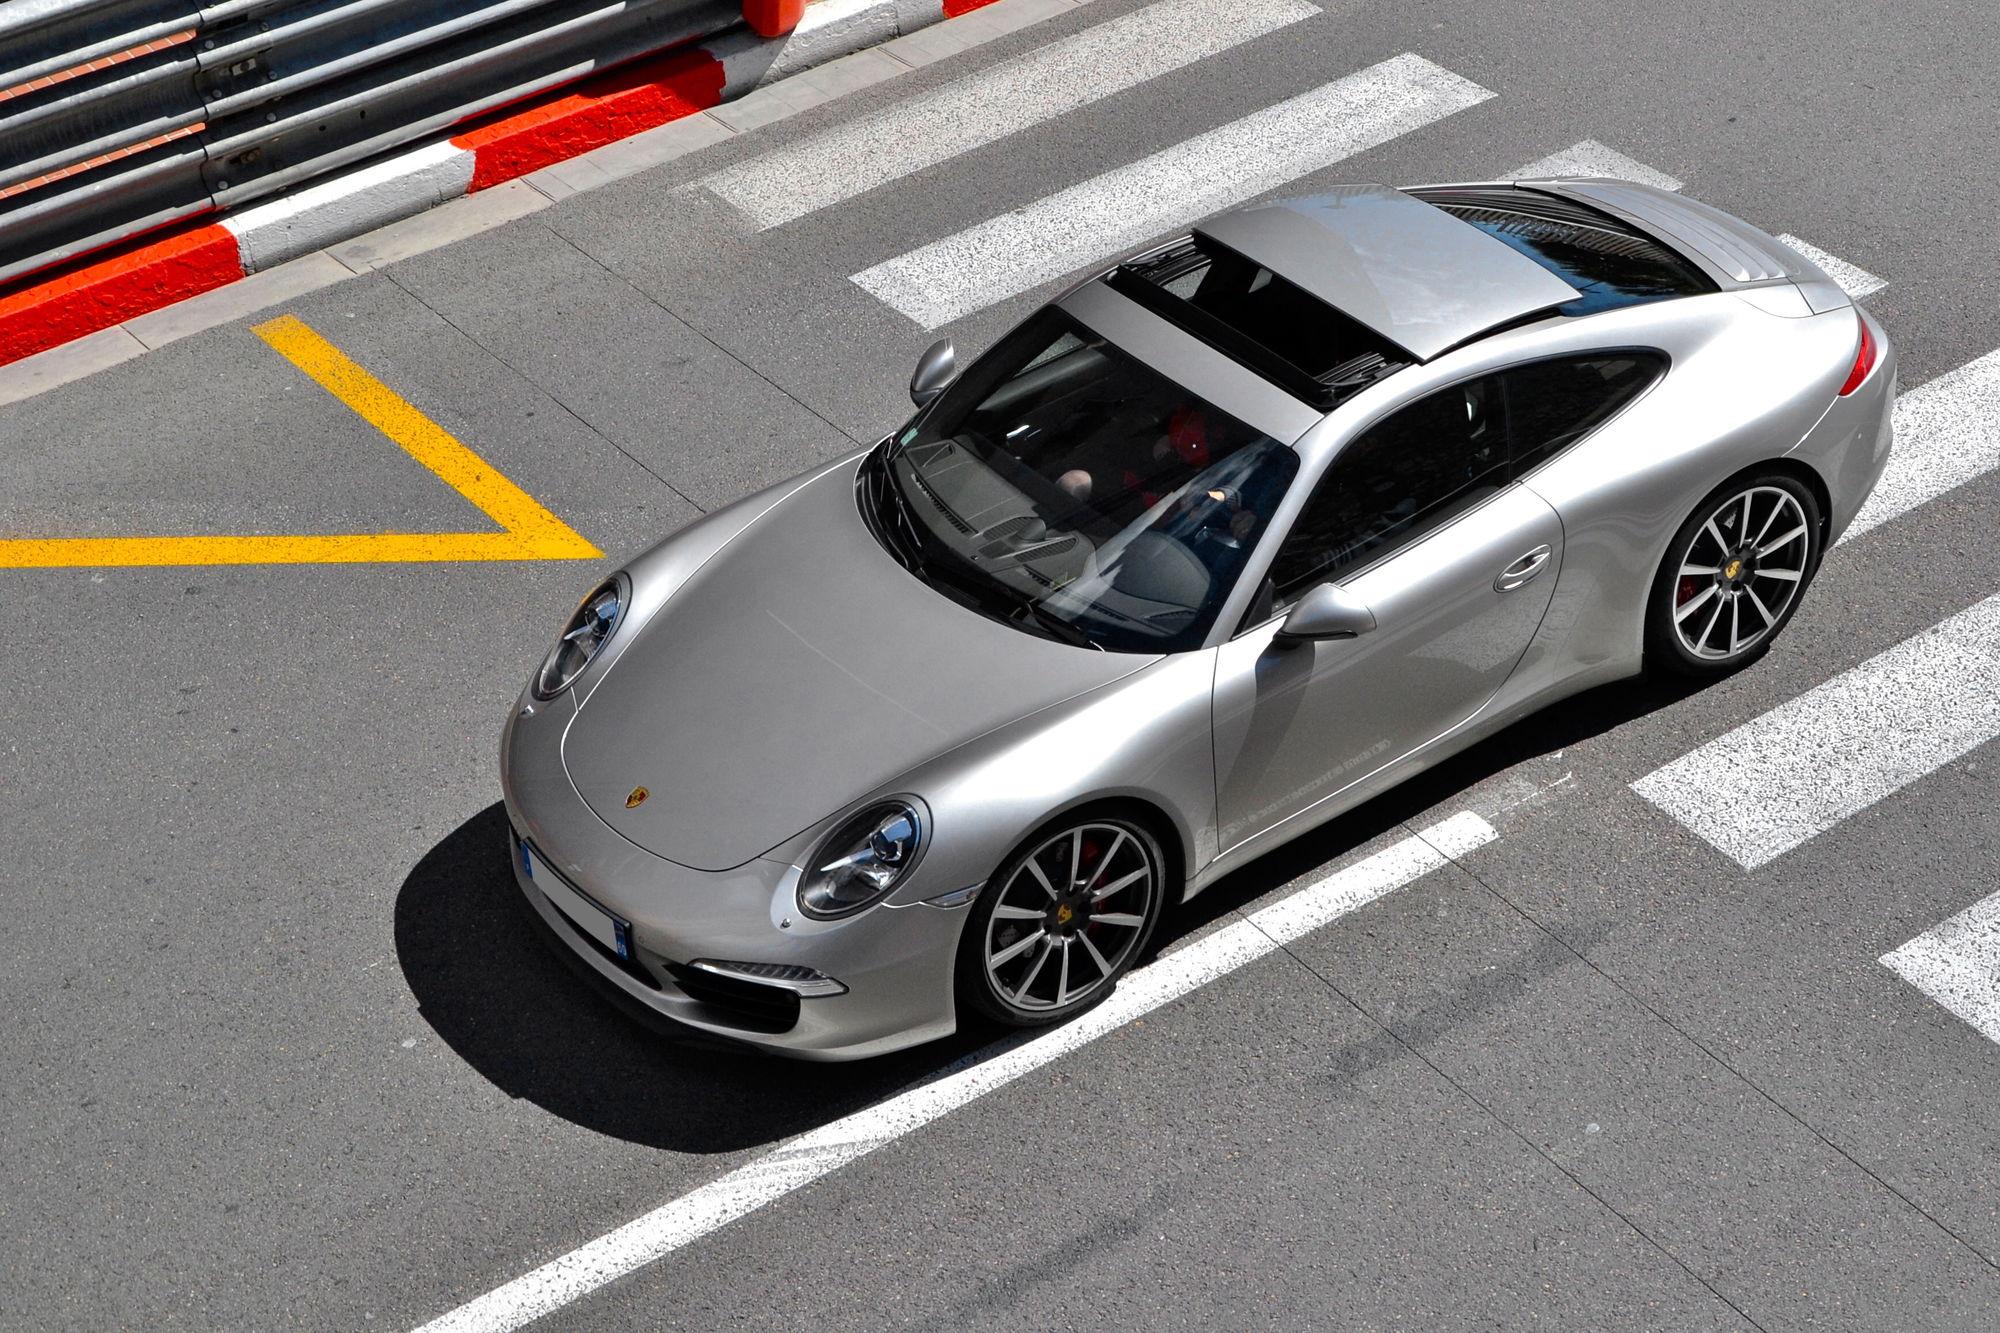 Sunroof Vs Cabriolet Rennlist Porsche Discussion Forums